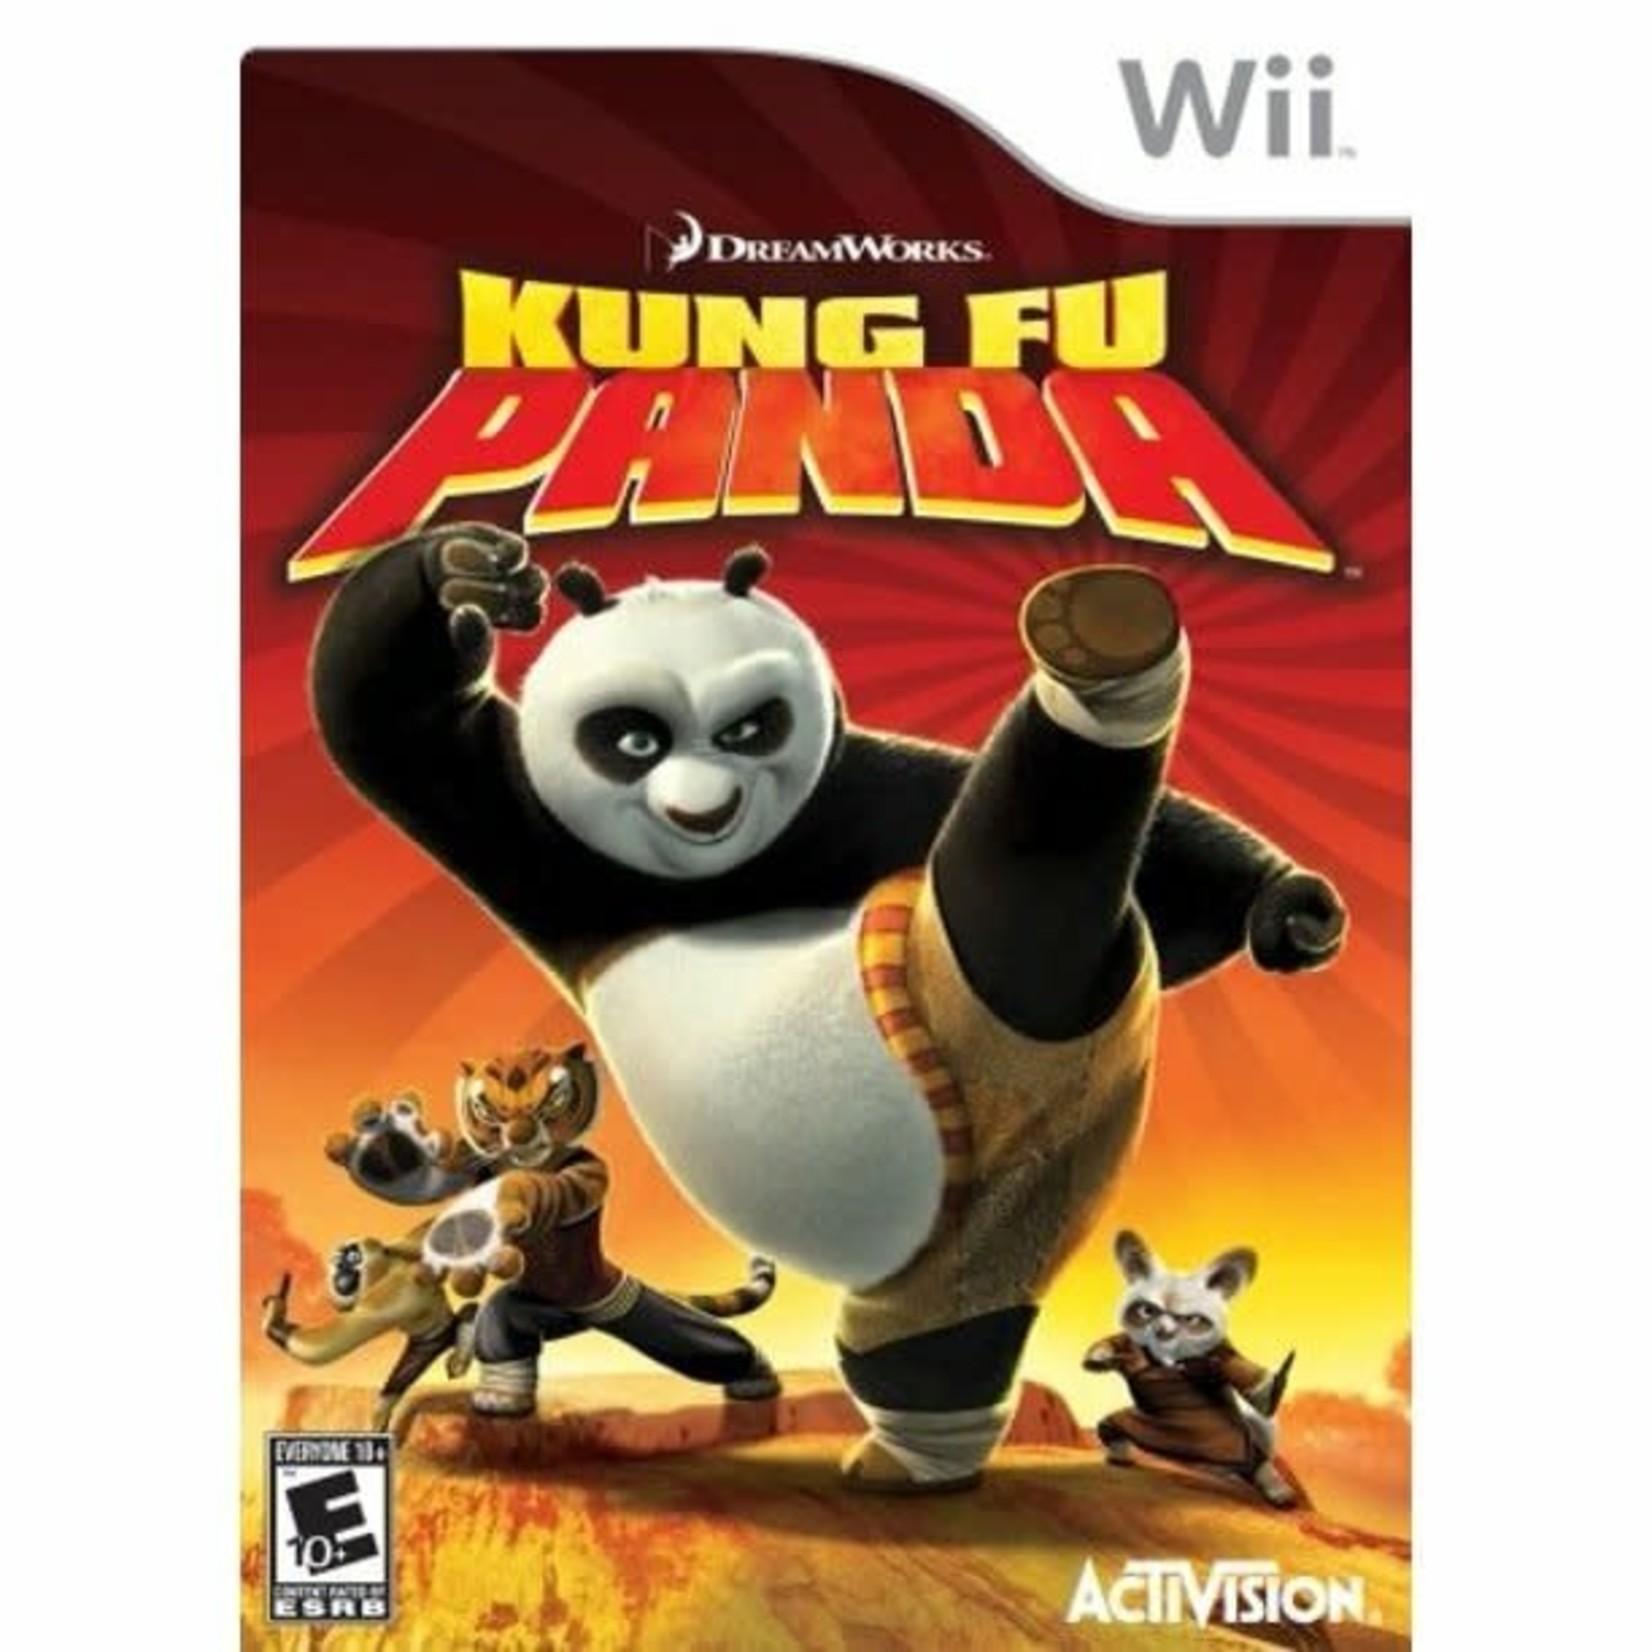 wiiusd-Kung Fu Panda